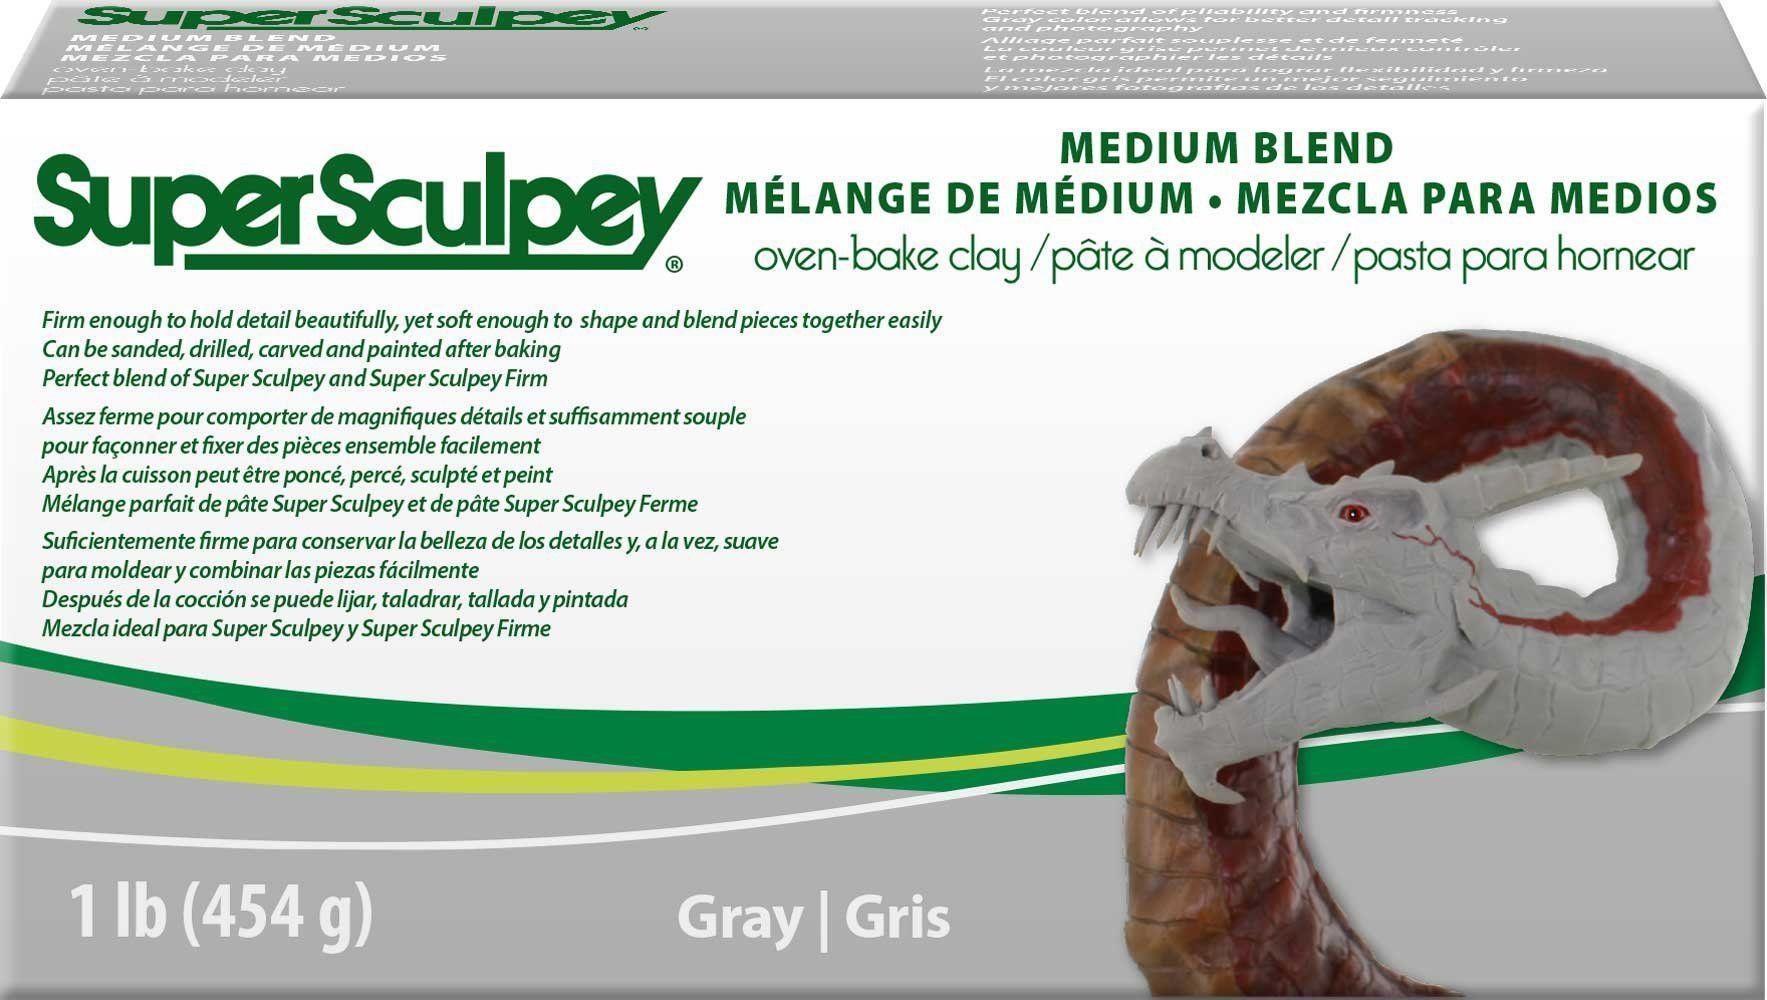 SUPER SCULPEY® MEDIUM BLEND